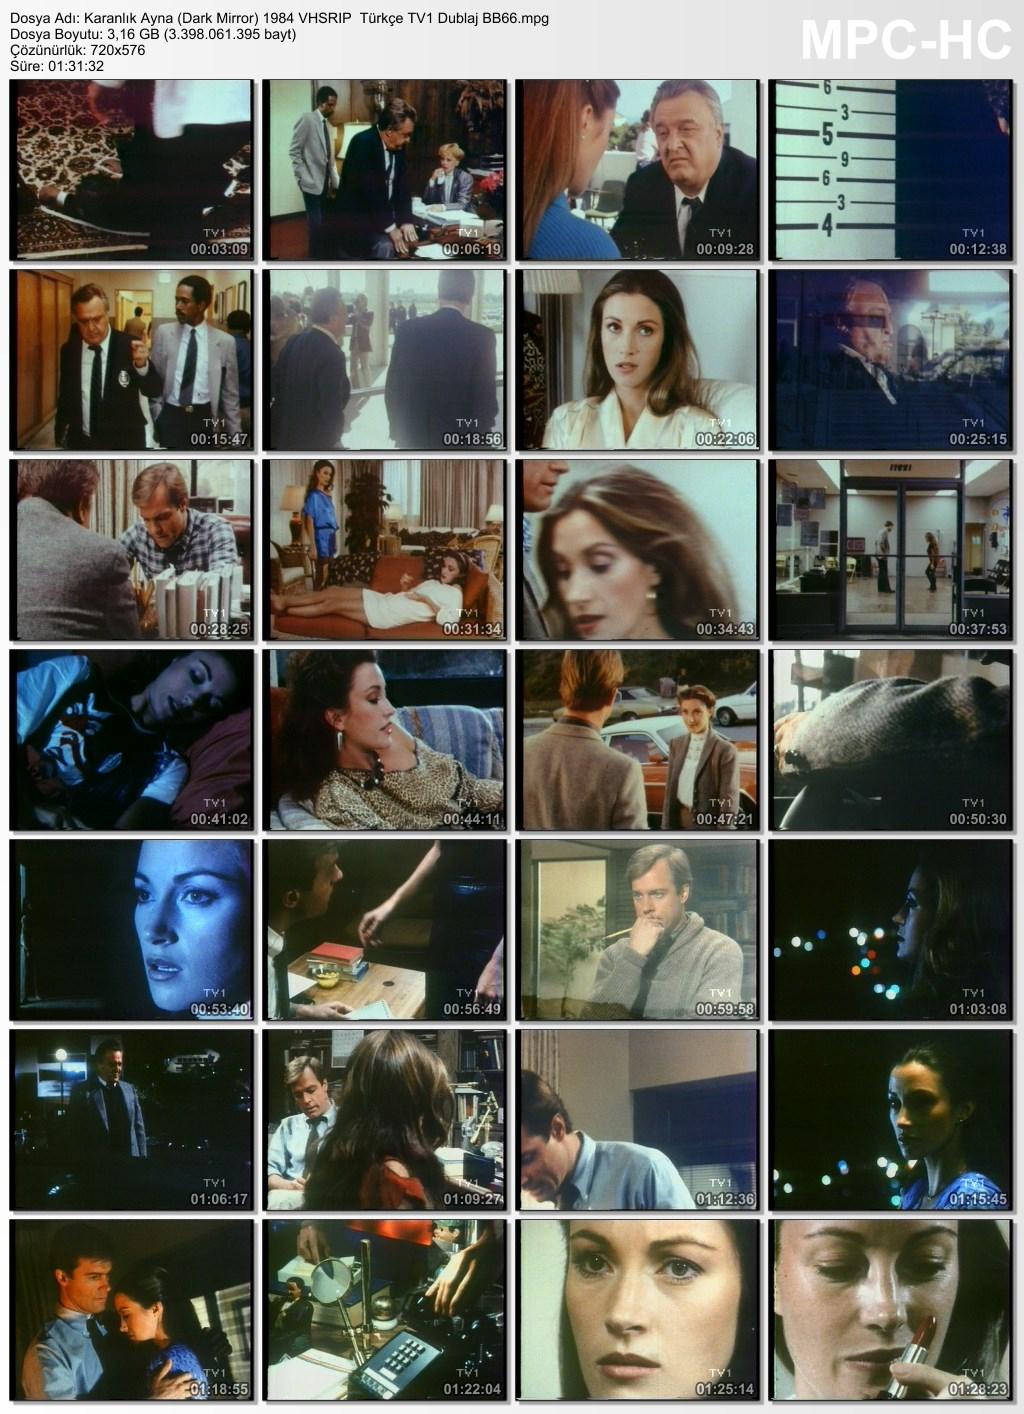 Karanlık Ayna (Dark Mirror) 1984 VHSRIP  Türkçe TV1 Dublaj BB66 - barbarus